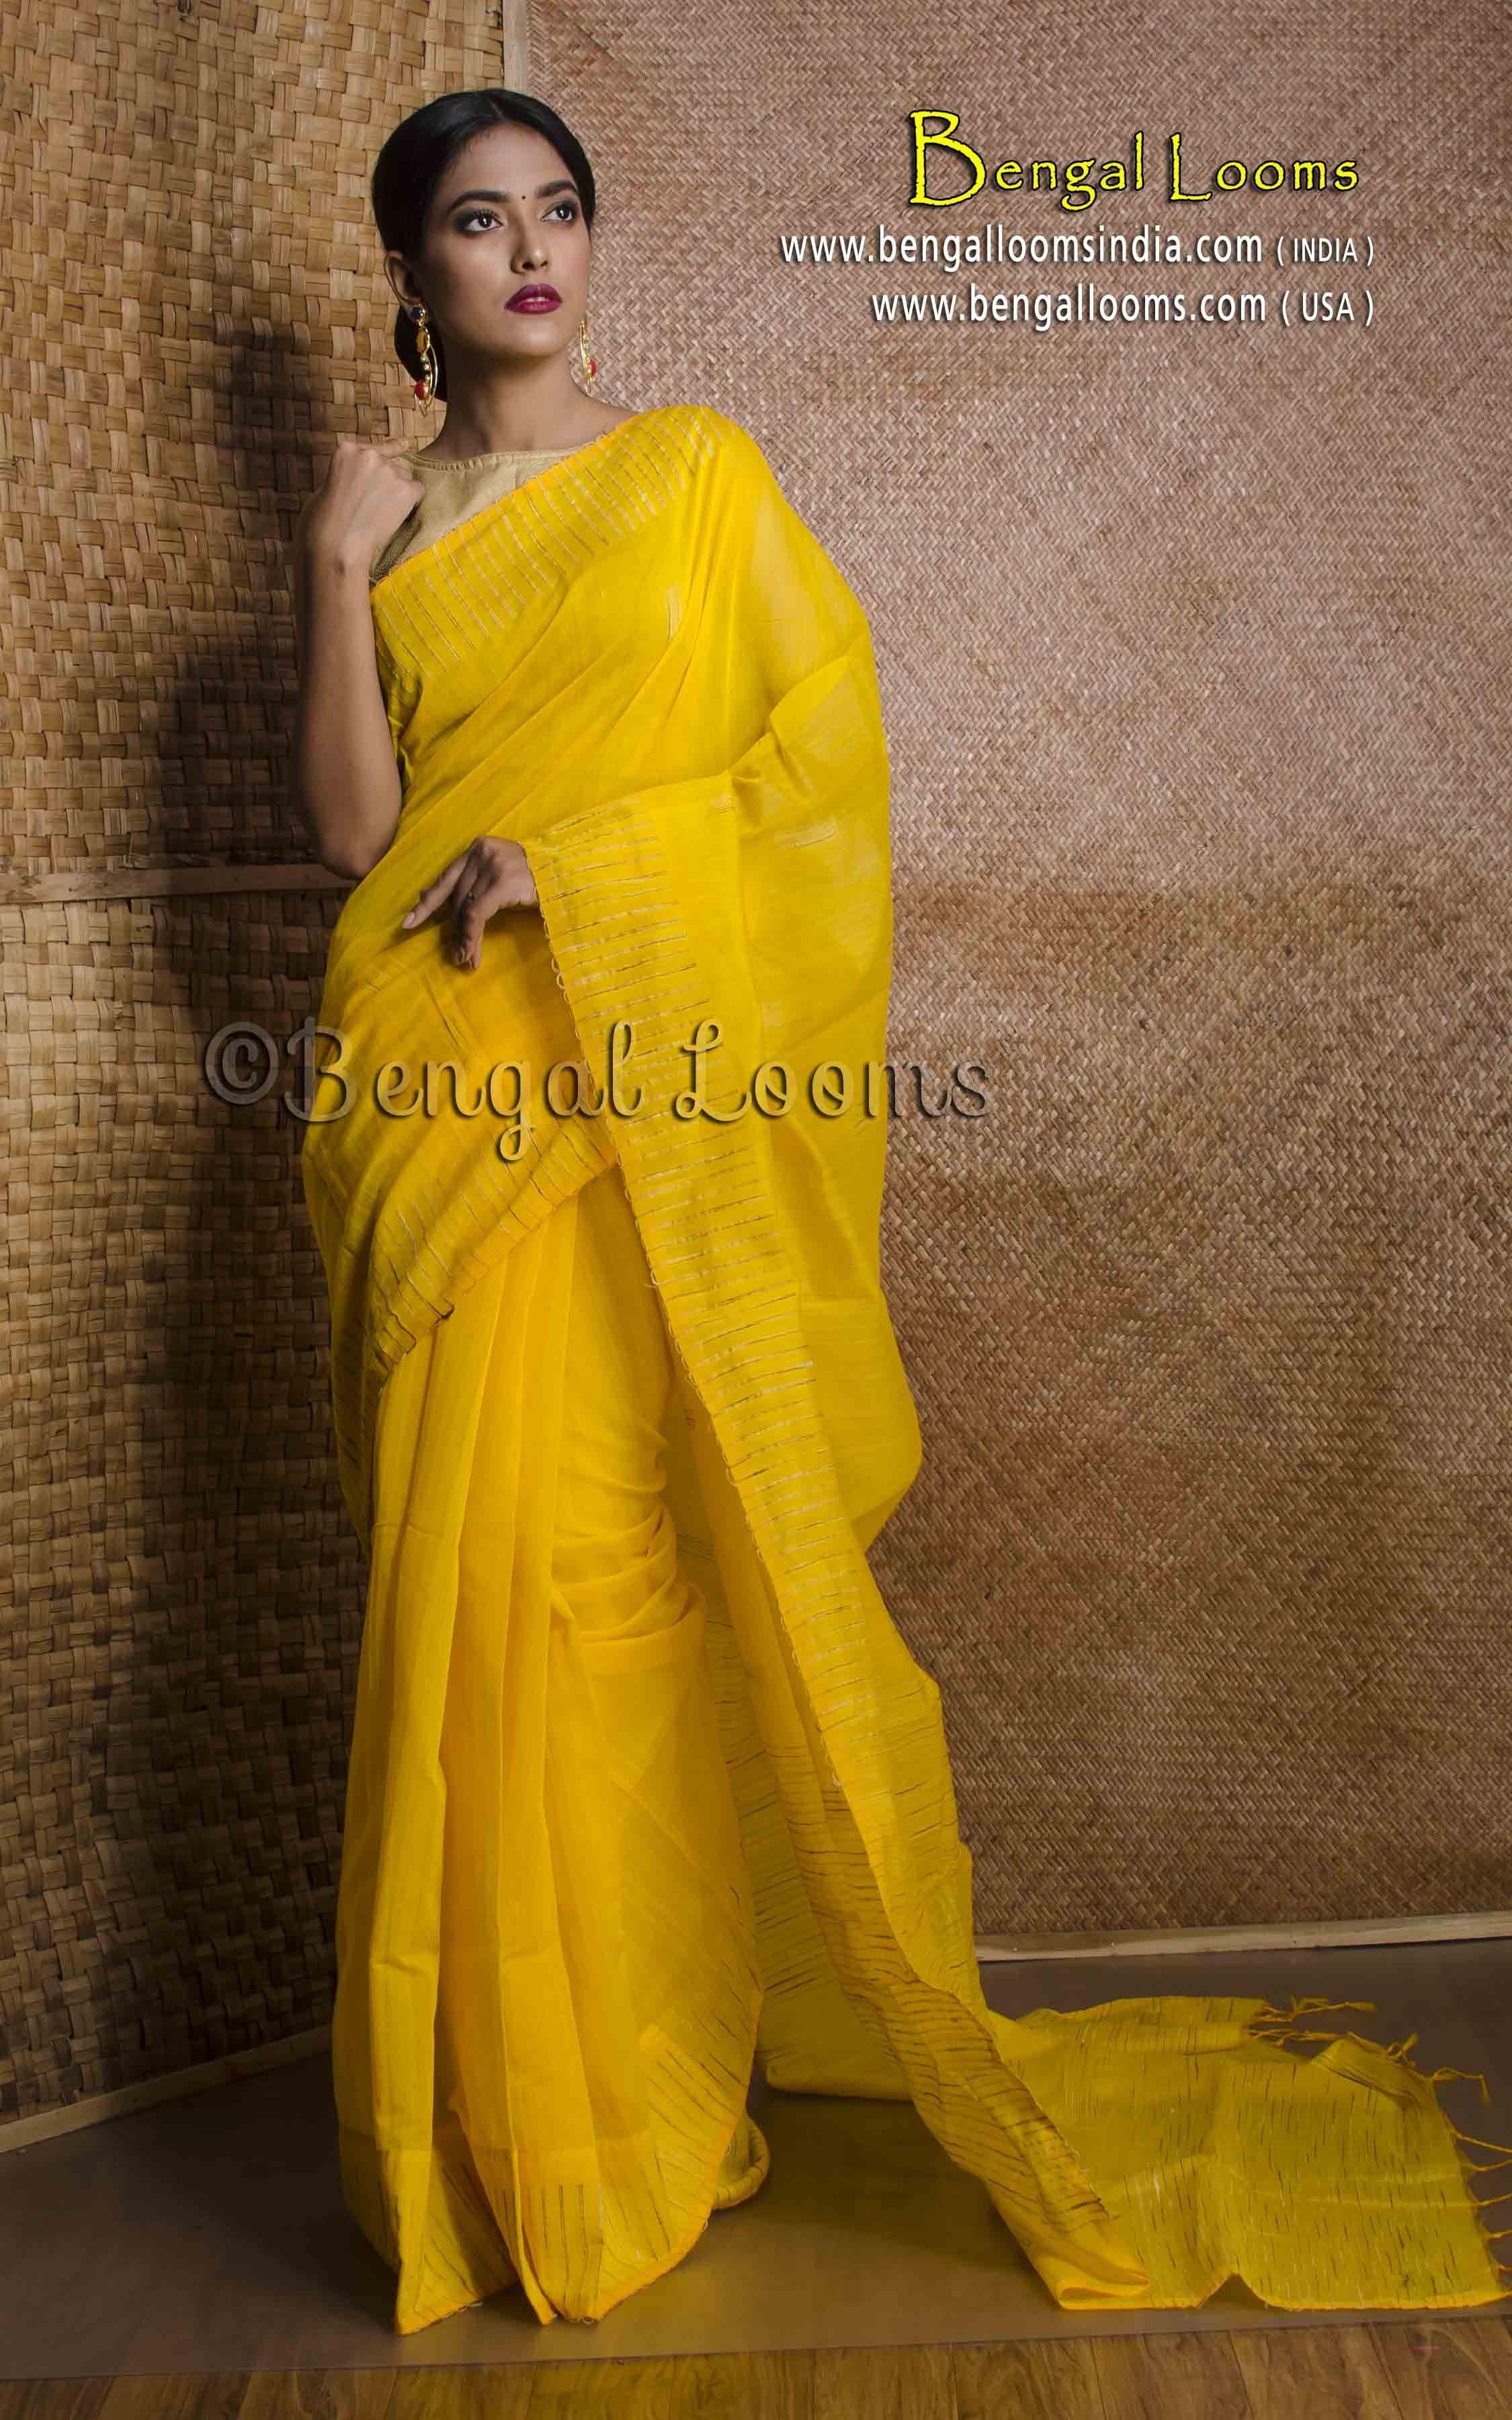 d18f69461a694b Khadi Cotton Saree With Gicha Thread Work Border in Bright Yellow ...